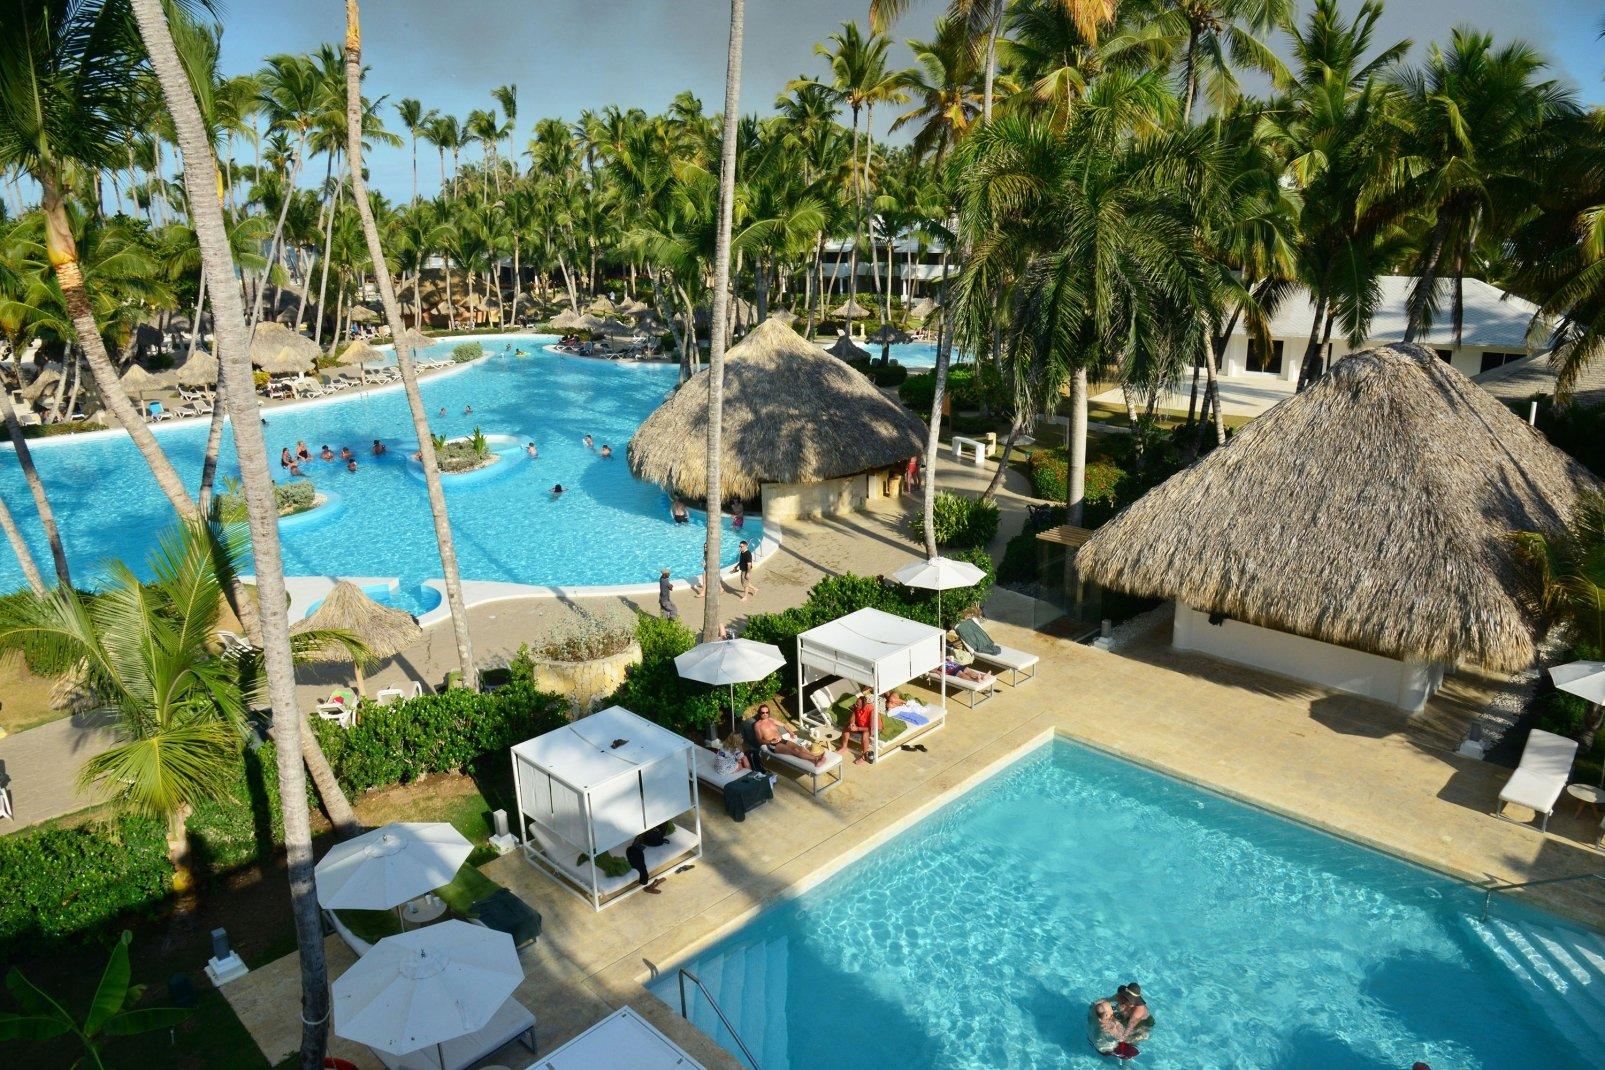 Melia Punta Cana Beach - A Wellness Inclusive Resort (- Adults Only) - 5* - 1